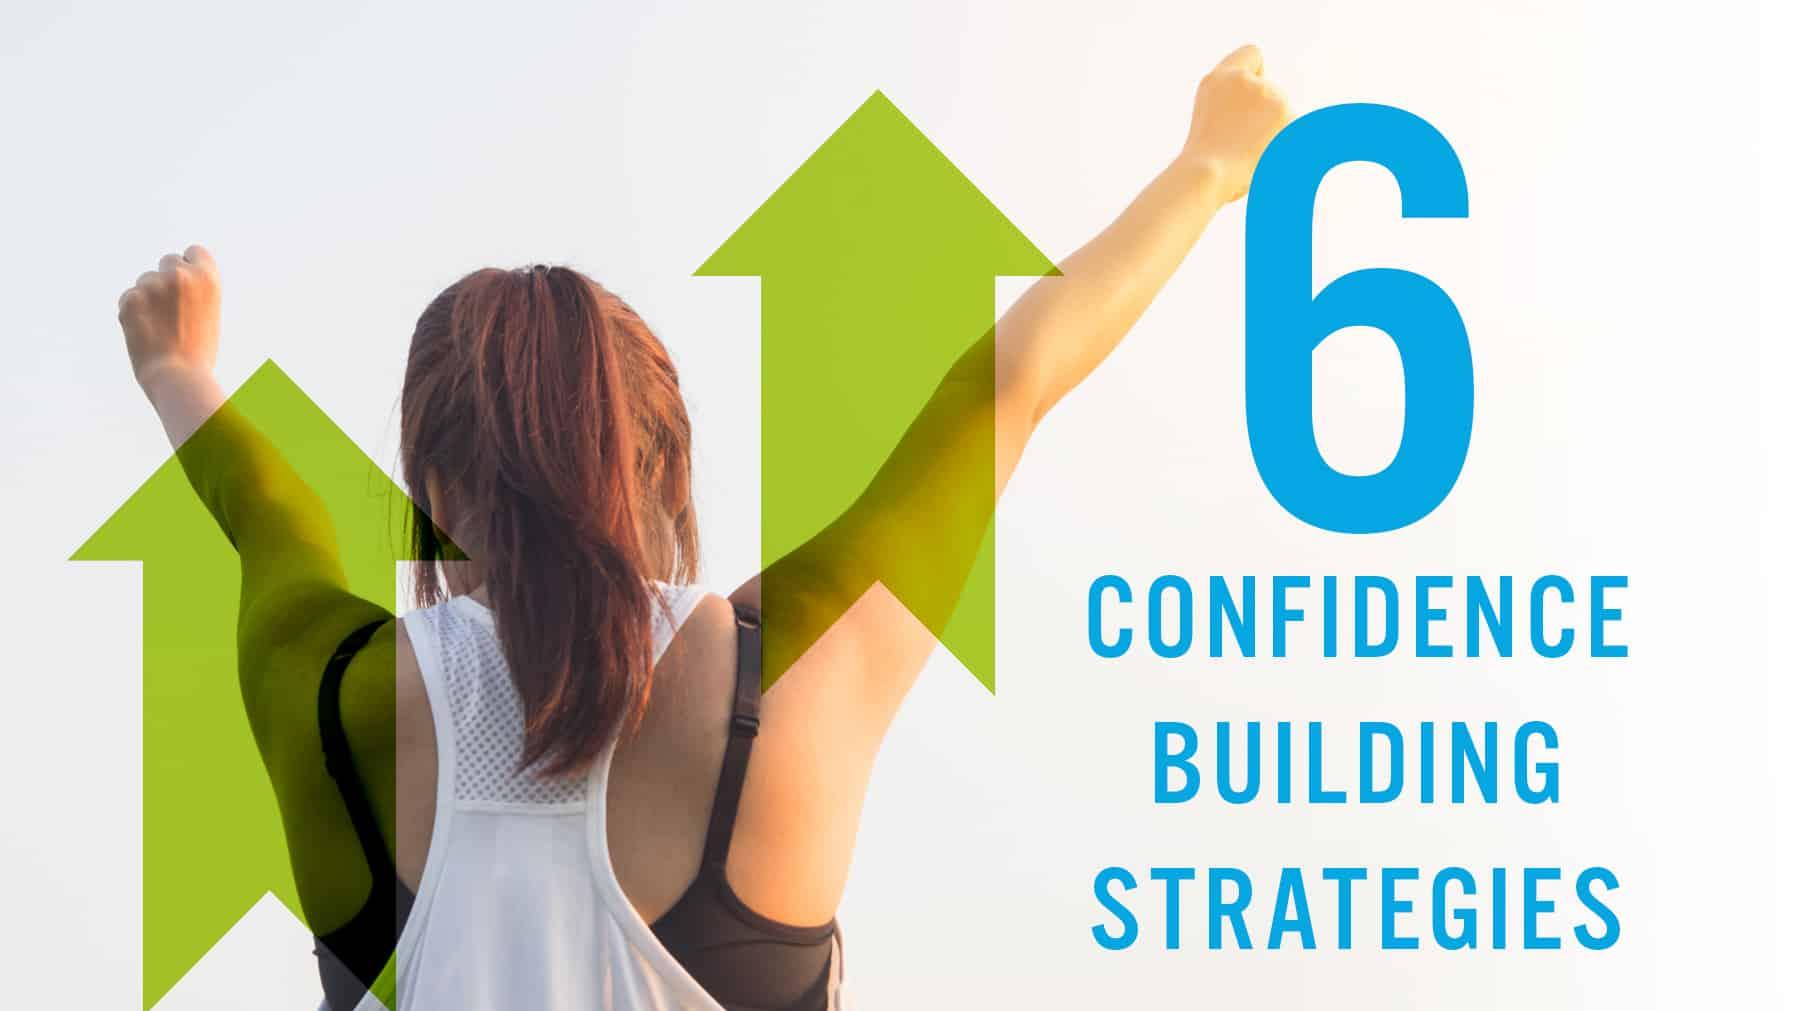 6 confidence building strategies